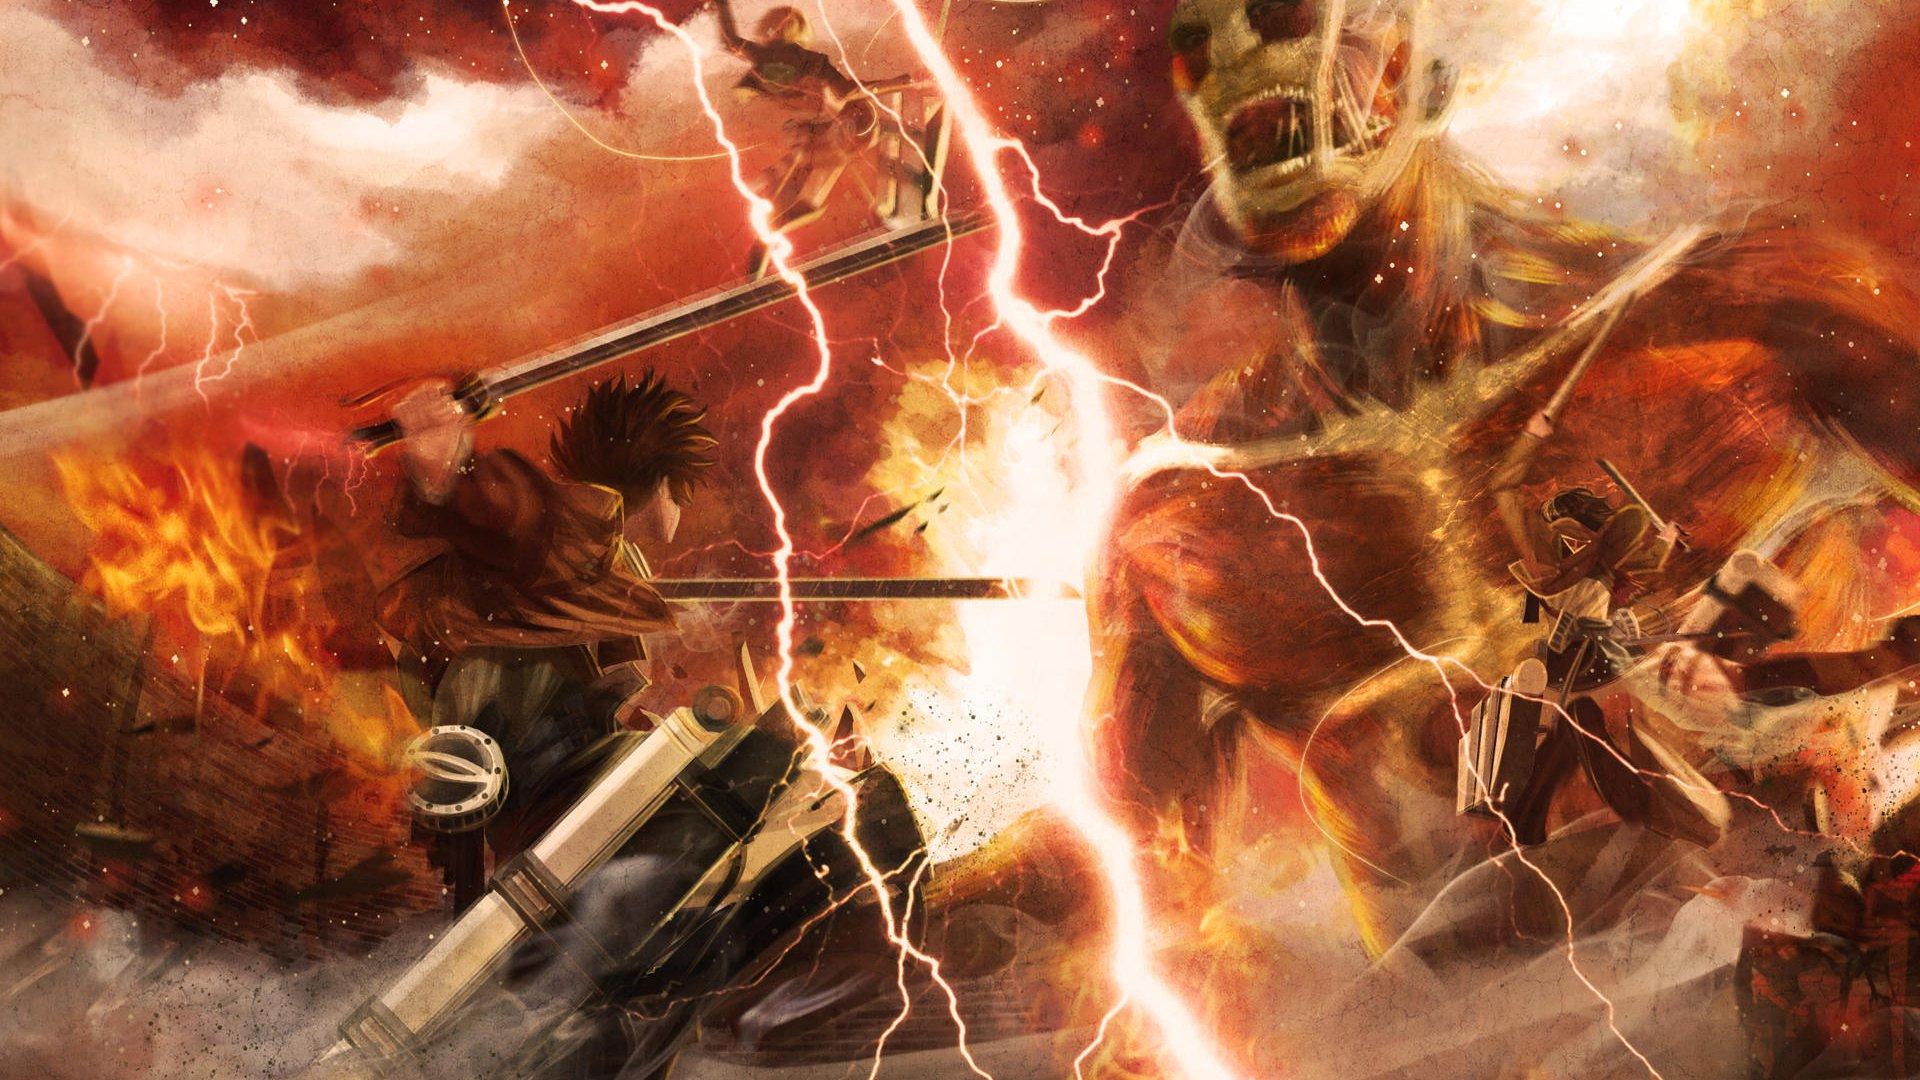 Attack On Titan Hd Wallpaper Hd Wallpaper Backgrounds Attack On Titan Hd Background 1920x1080 Download Hd Wallpaper Wallpapertip